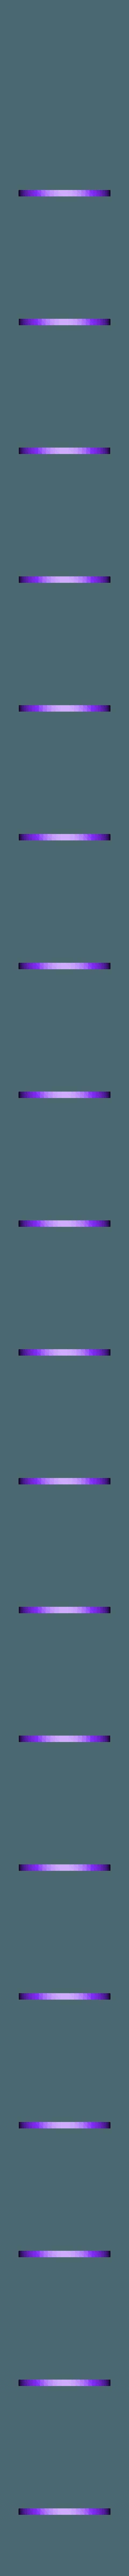 Red_Lantern_Ring_pt2.STL Download free STL file Red Lantern Ring for Dual Extrusion • 3D printer model, niceandeasy